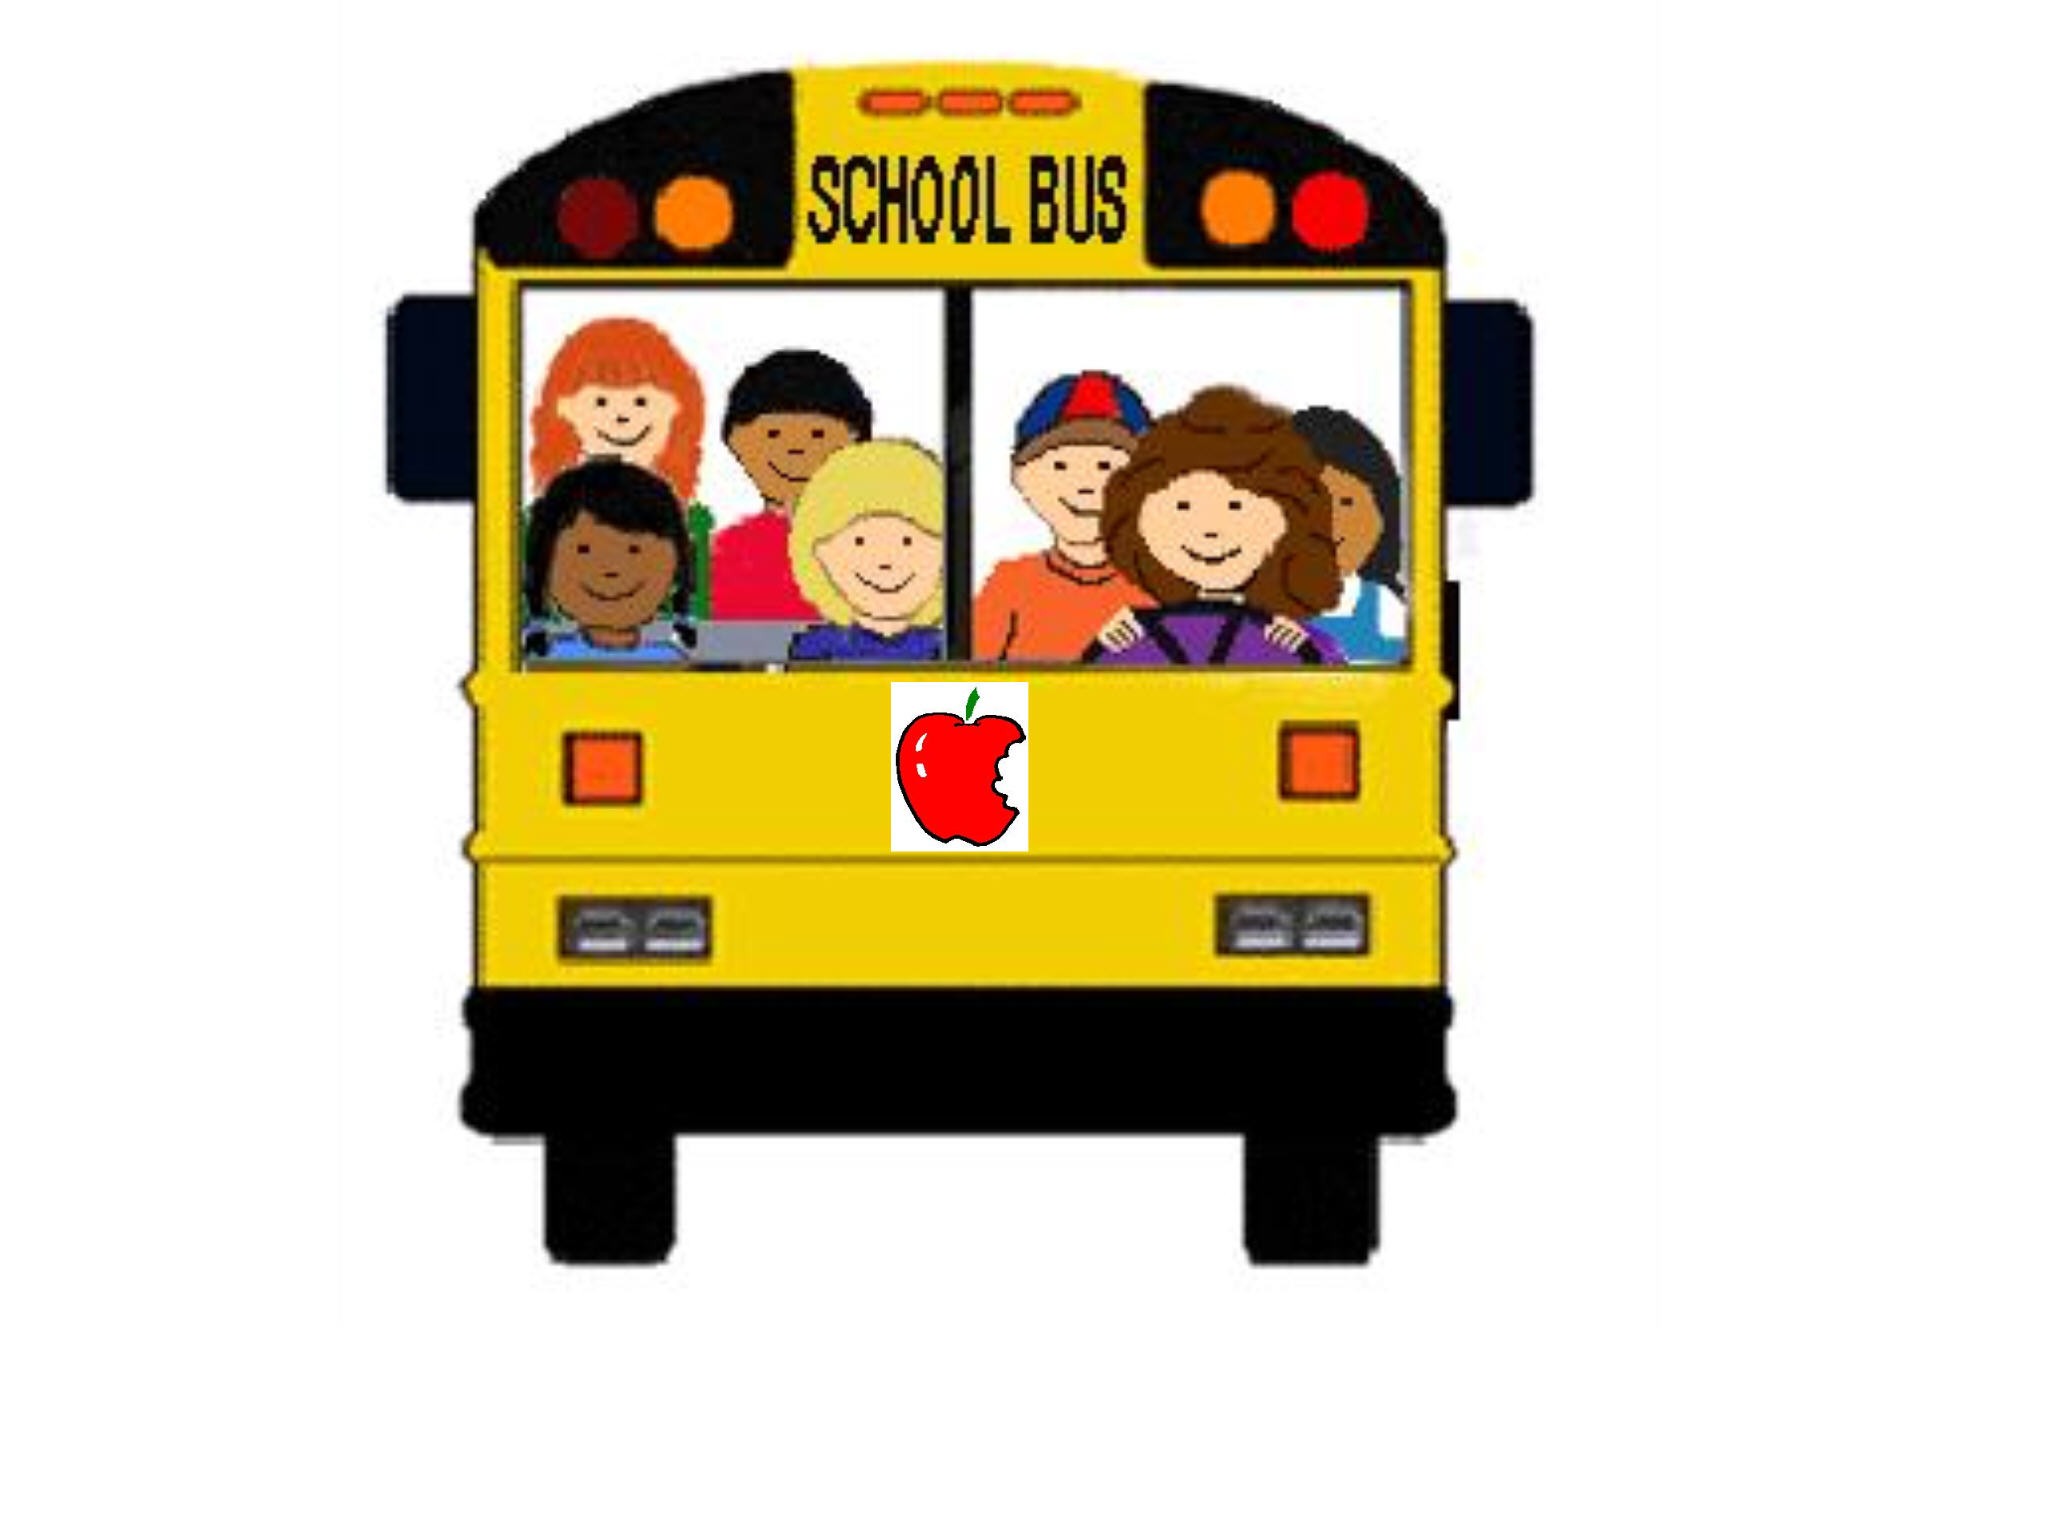 School bus cute.